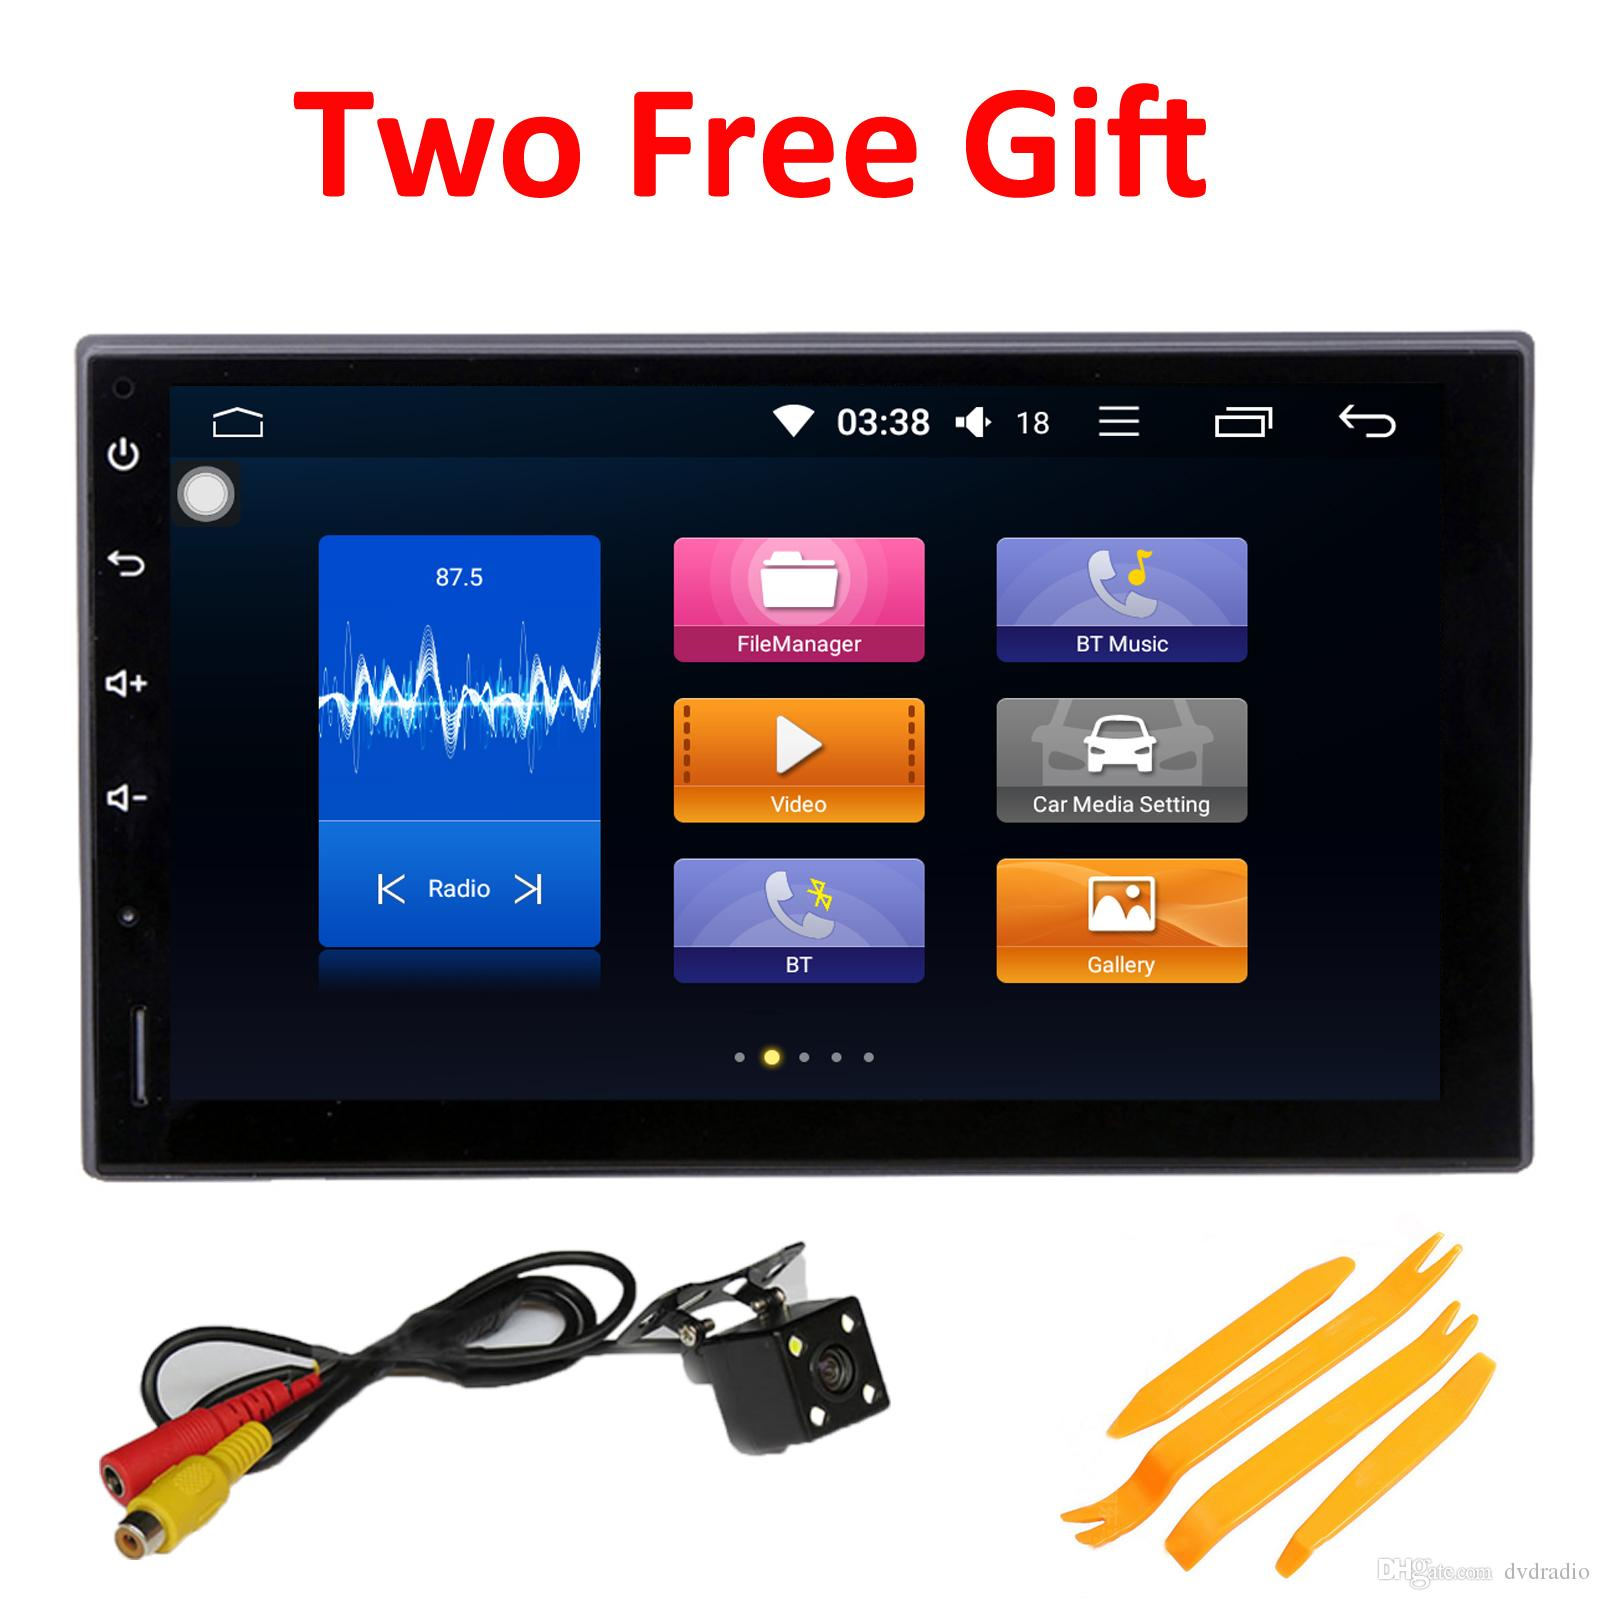 b7f1a543d COIKA Double Din Car DVD Player GPS Navi Radio Octa Core 4+32G RAM Android  8.0 System Car Head Unit WIFI 4G OBD DVR SWC BT RDS Mirror Screen